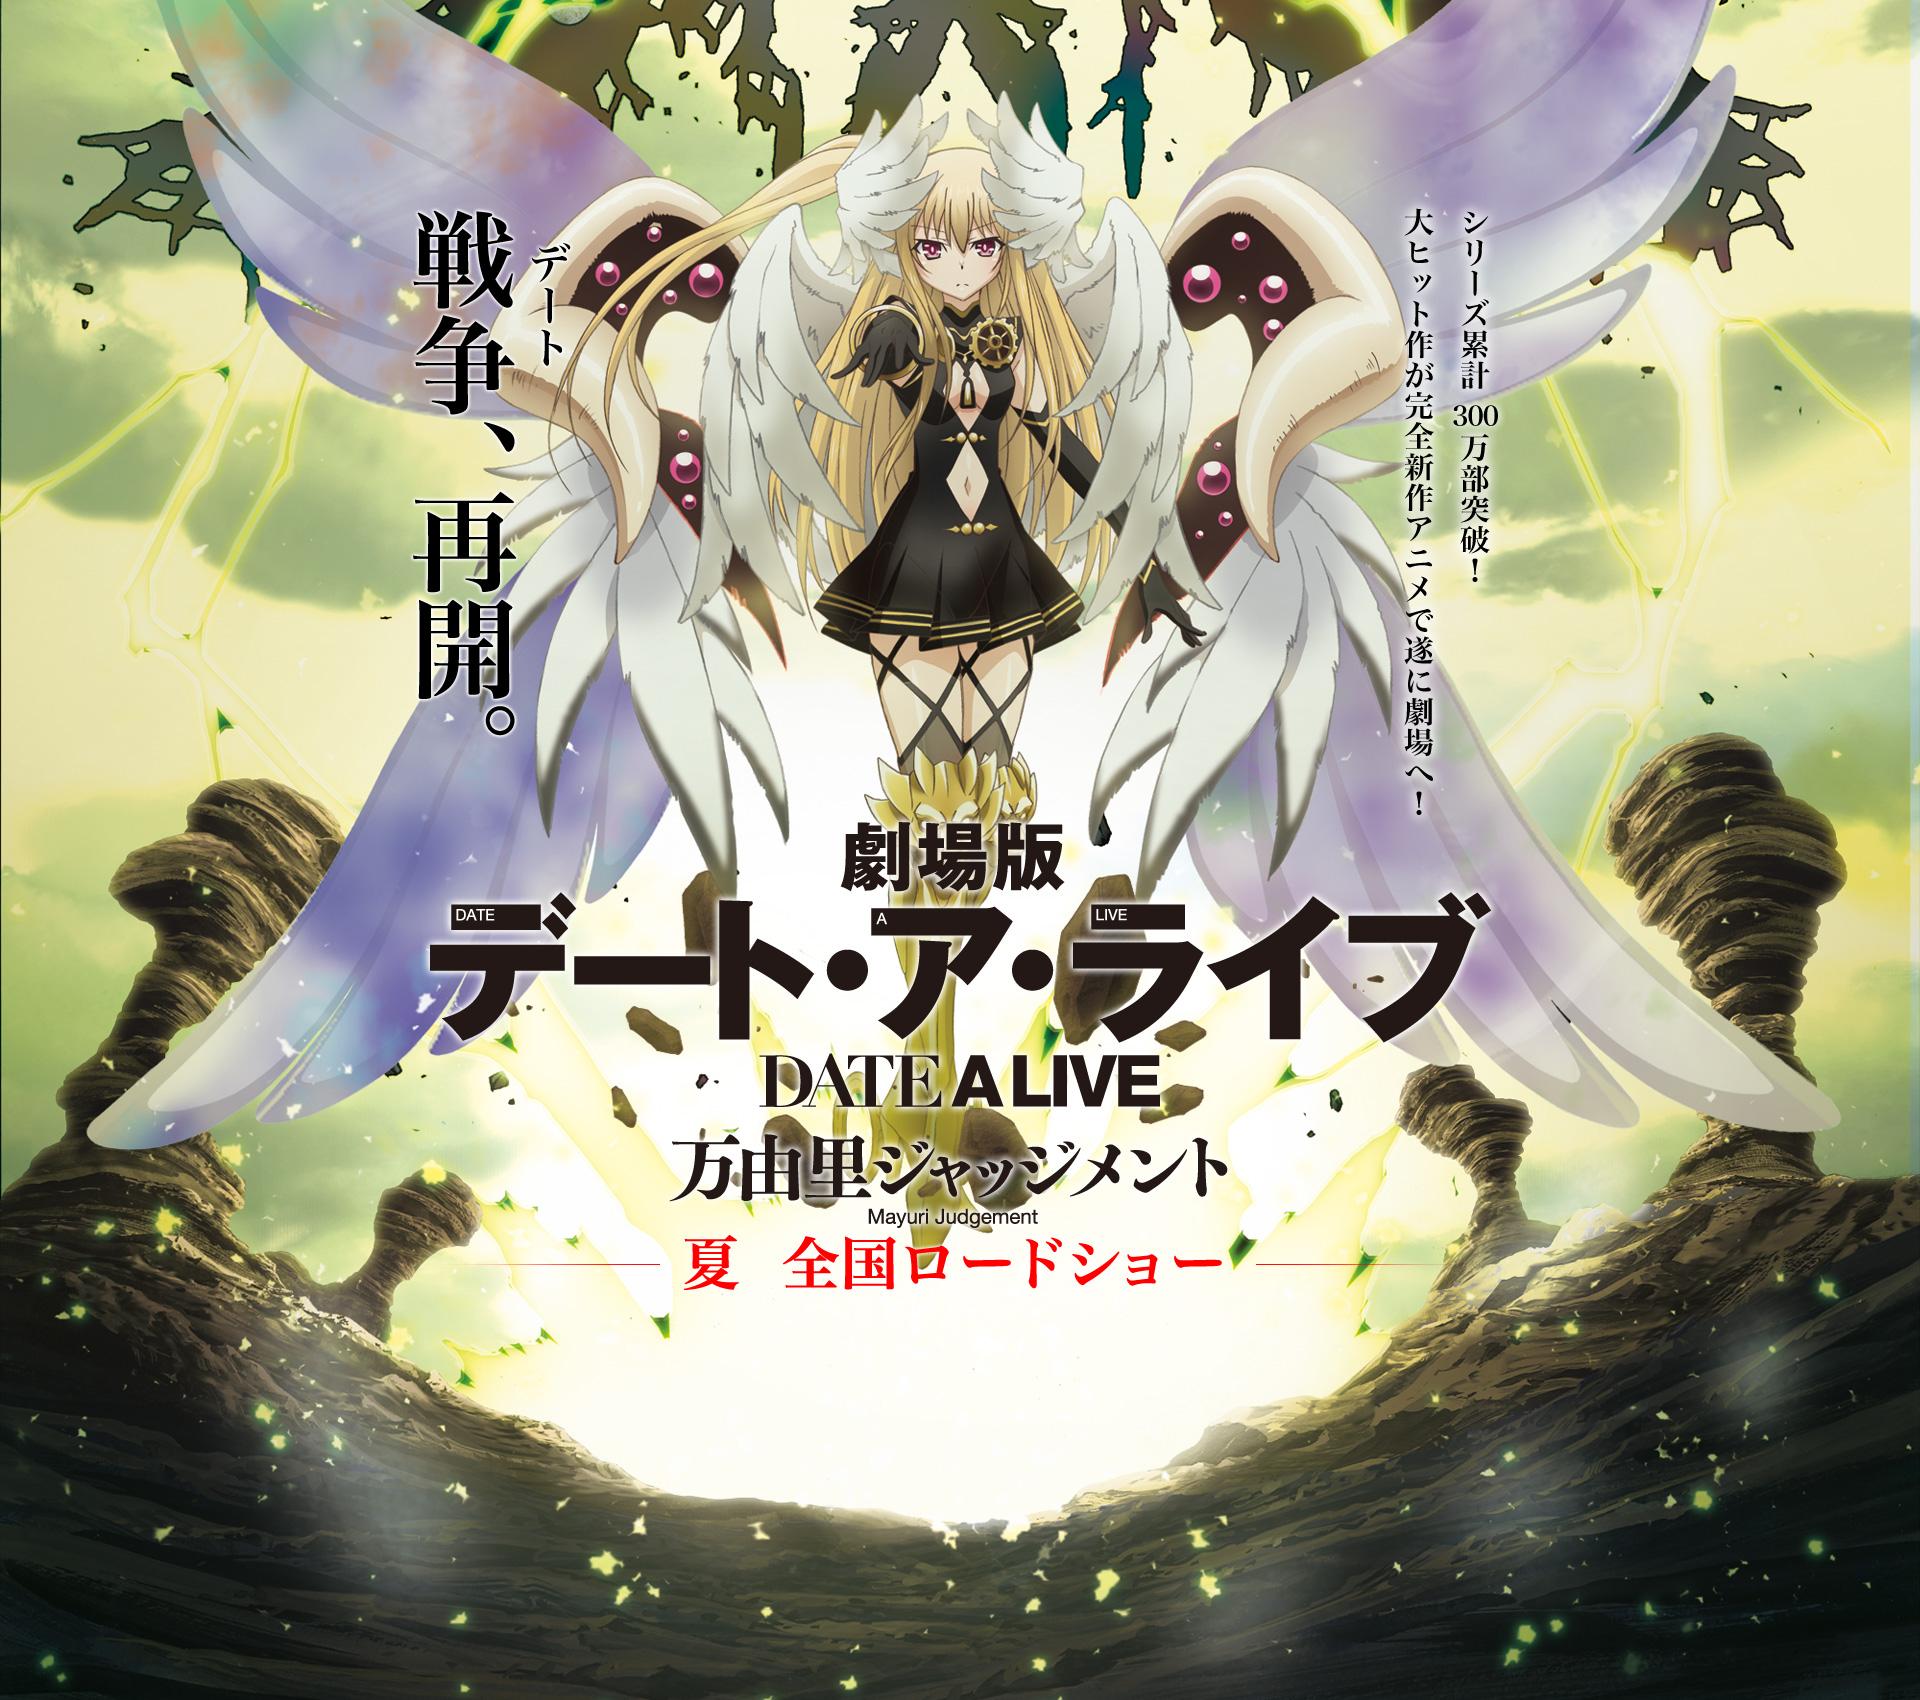 Date A Live Movie Mayuri Judgement anime visual